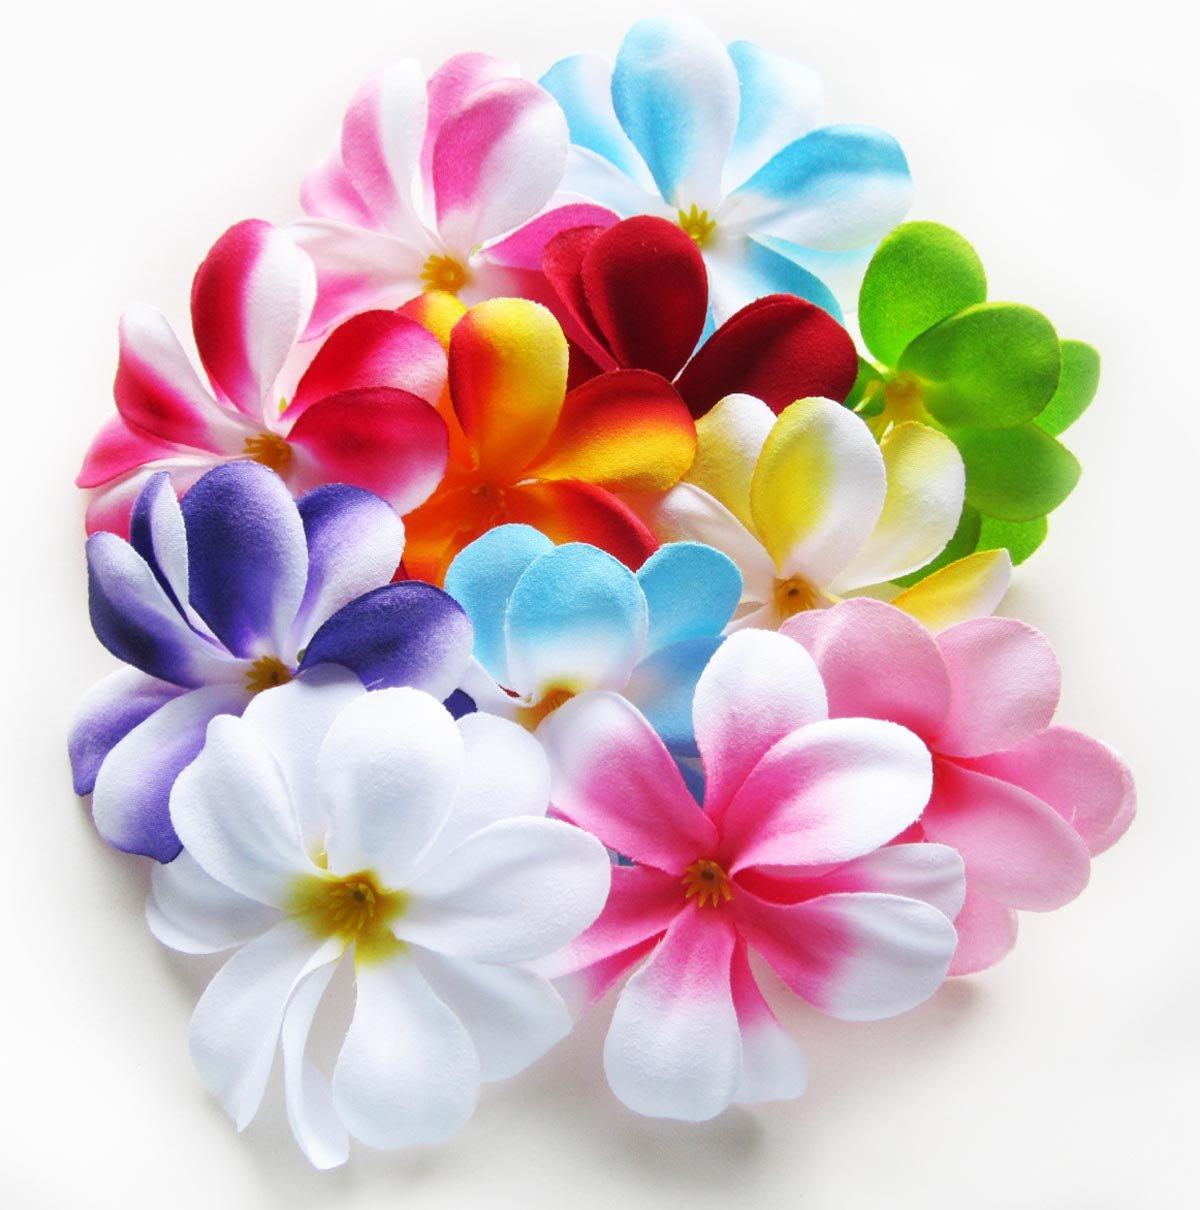 Amazon 100 Assorted Hawaiian Plumeria Frangipani Silk Flower